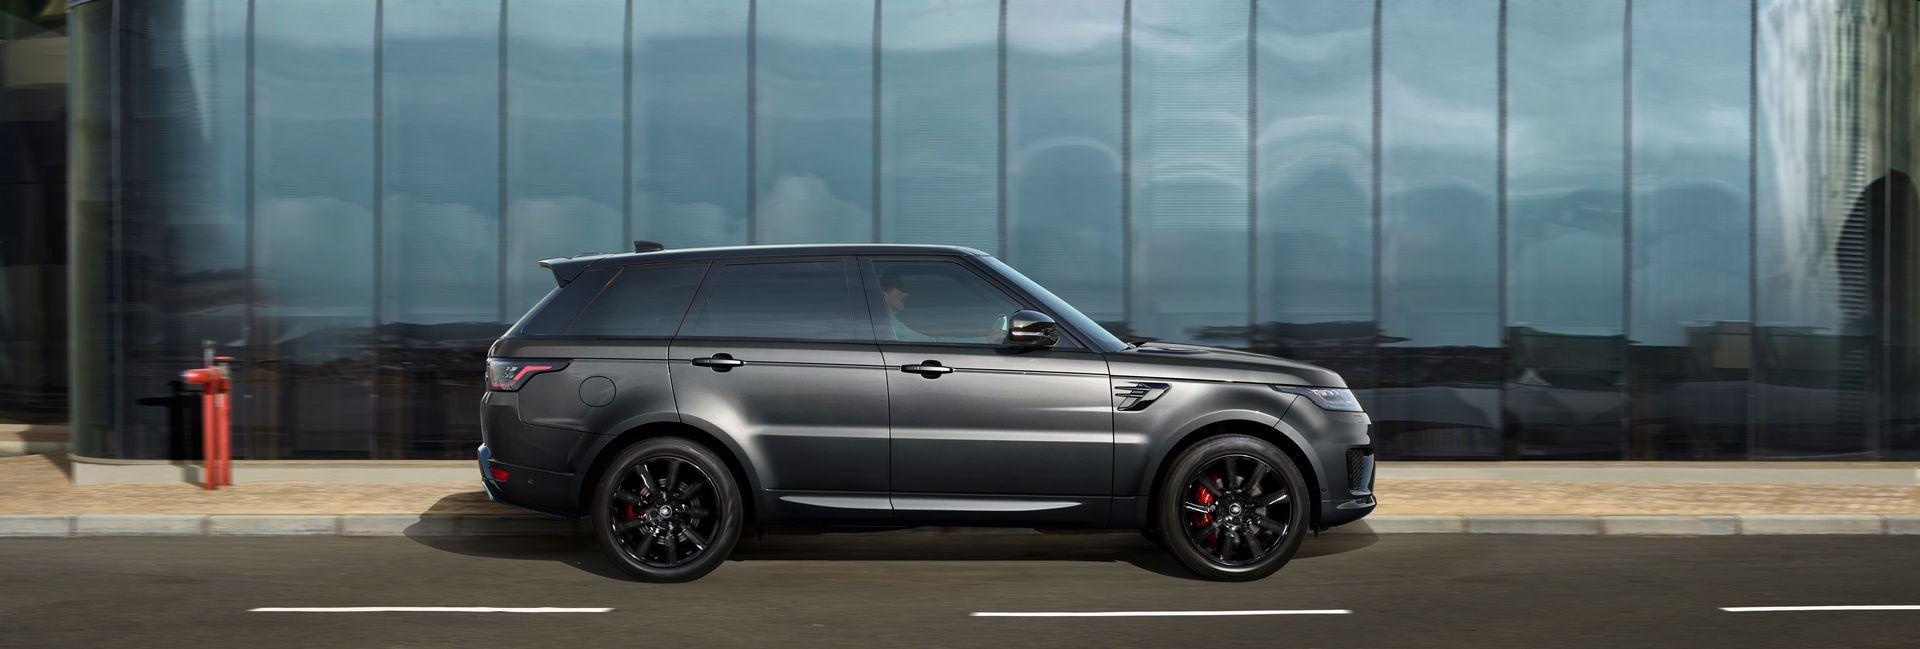 2021-Range-Rover-Sport-24